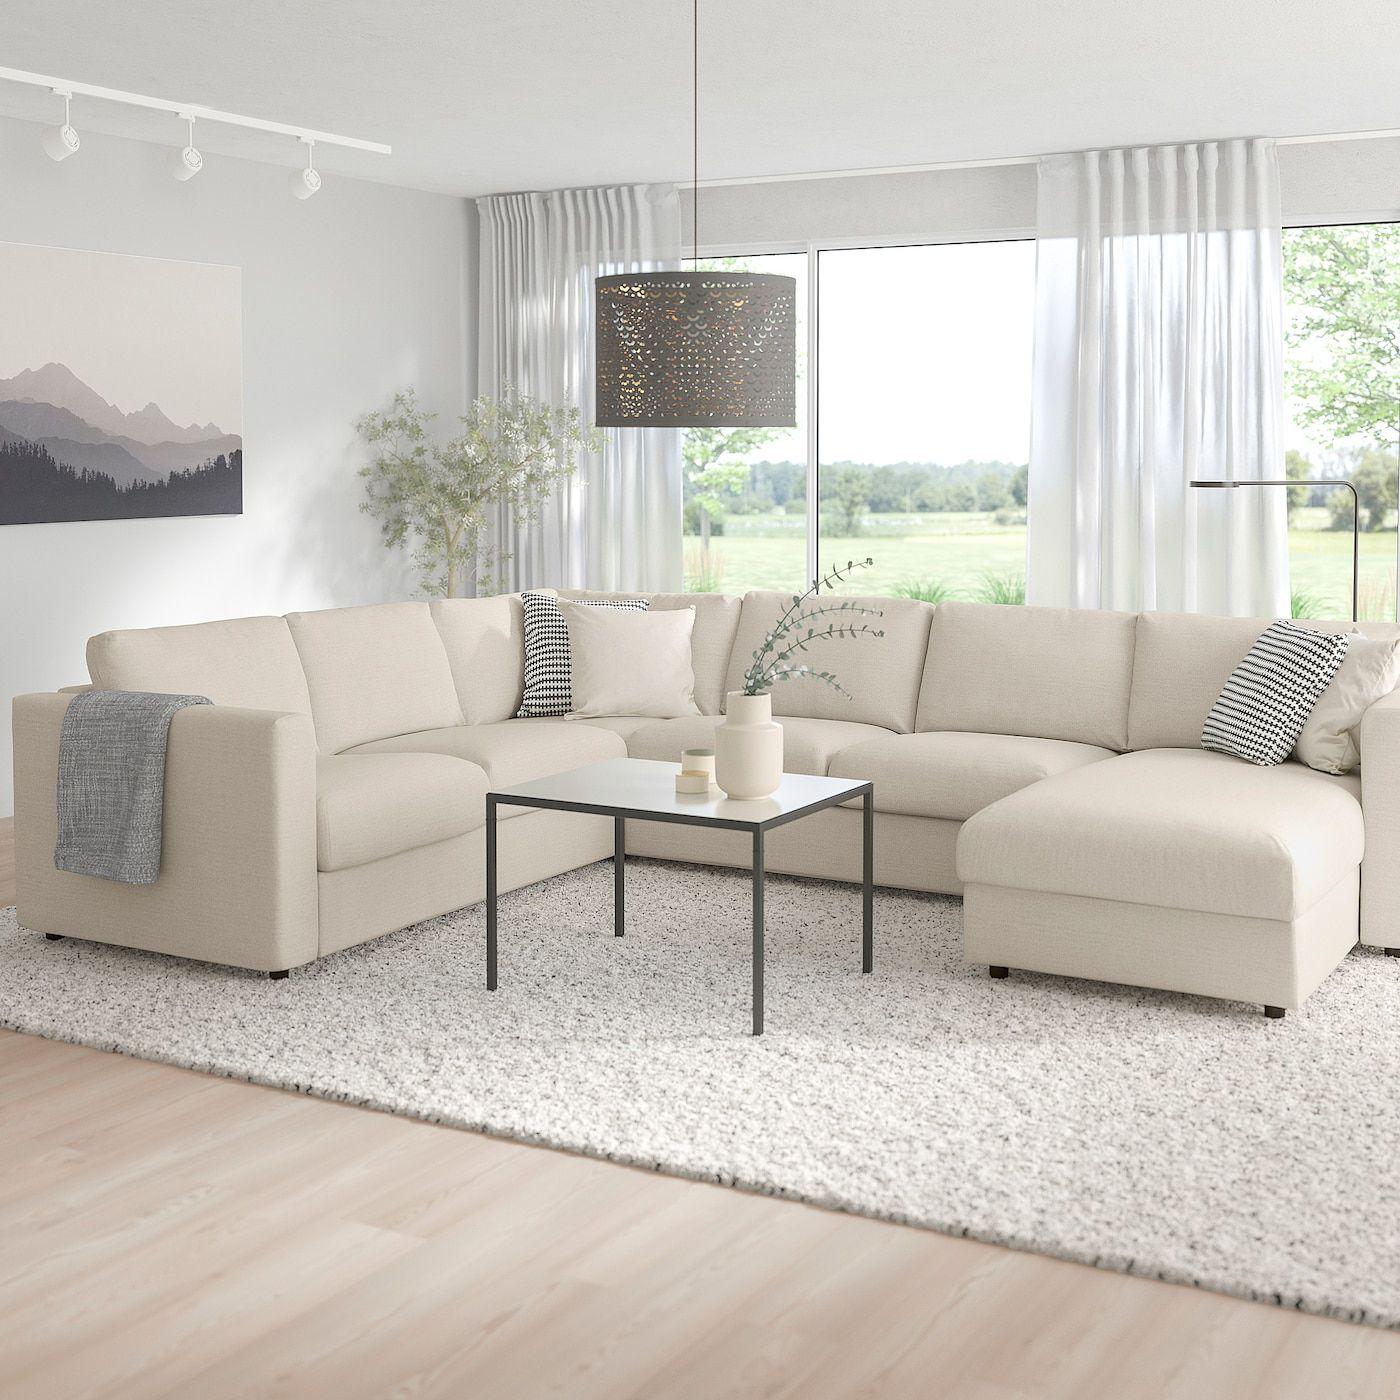 Ikea Vimle Corner Sofabed W Chaise With Chaise Gunnared Beige Bequemes Sofa Sofa Gemütliches Sofa